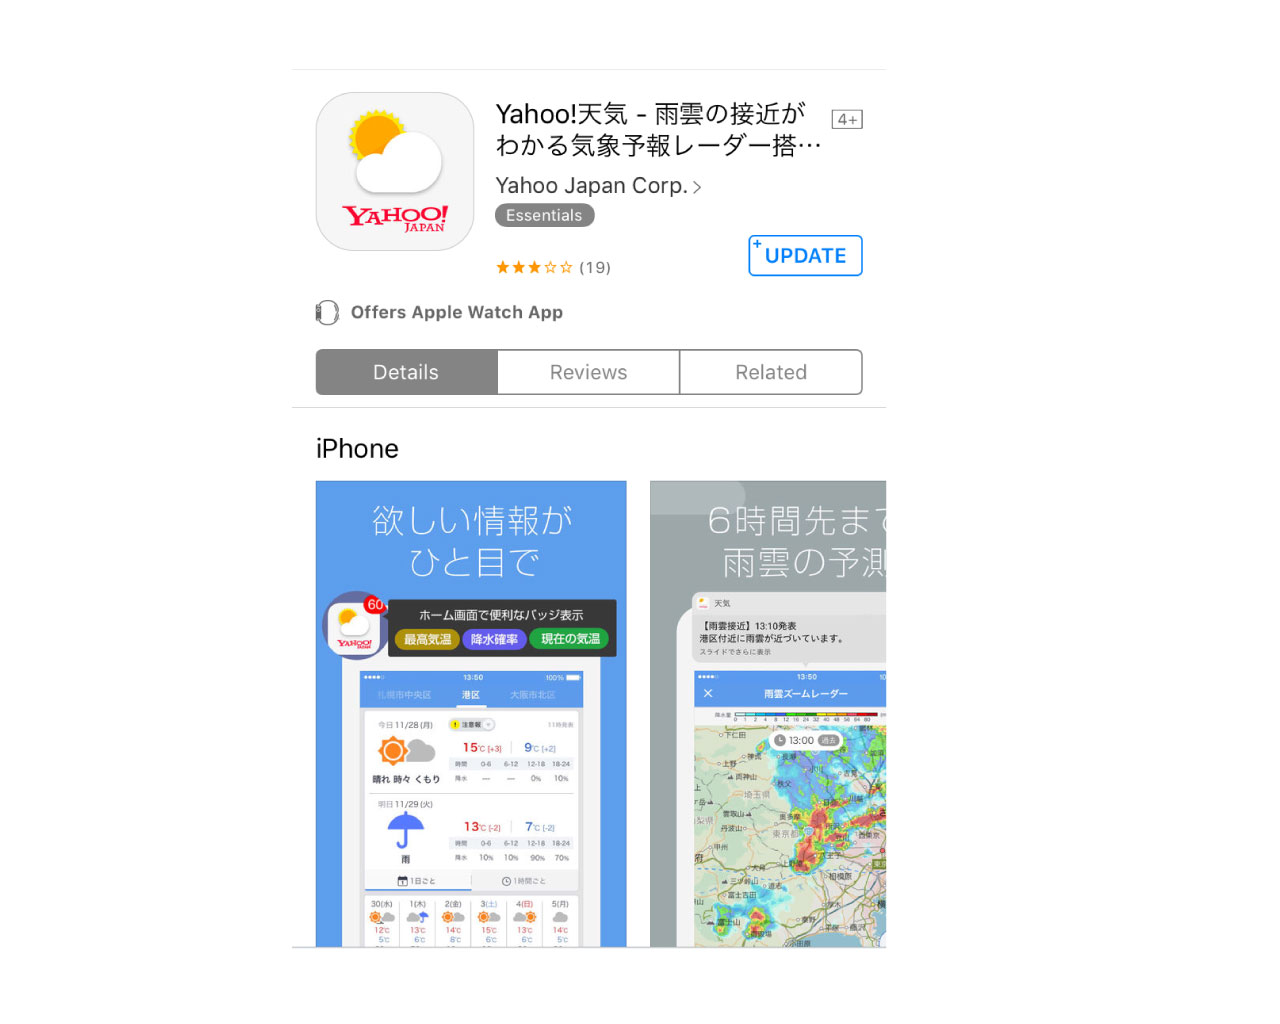 iphone-yahoo-tenki-app-yellowsand-pm25-1